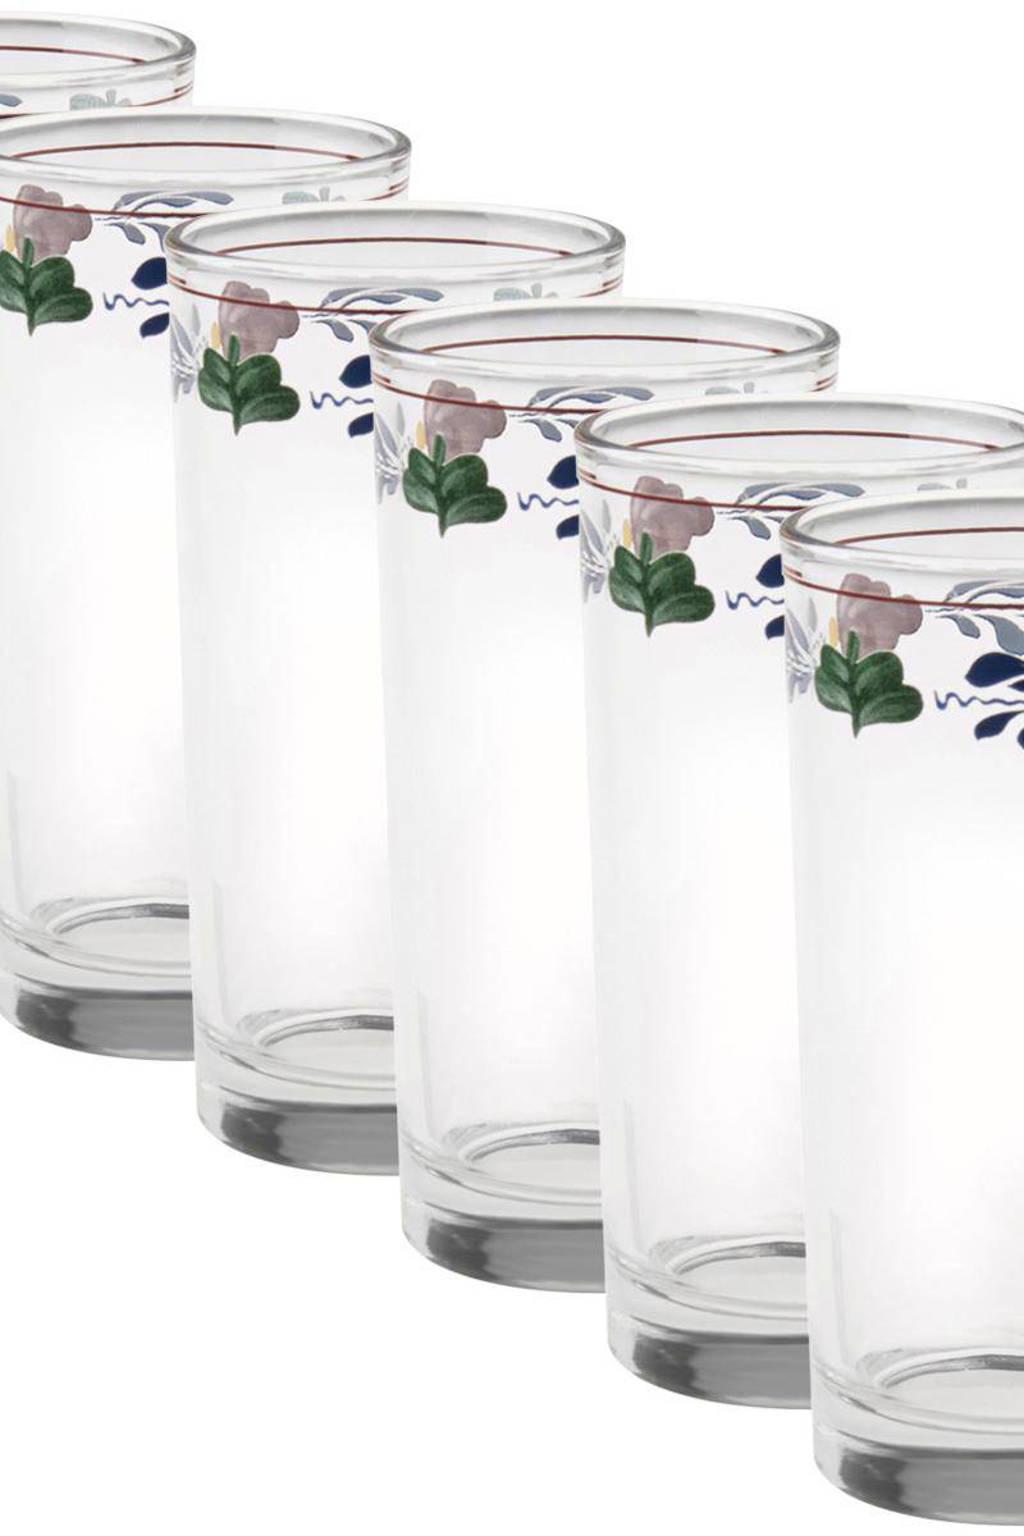 Boerenbont longdrinkglas (Ø6,5 cm) (set van 6), Transparant